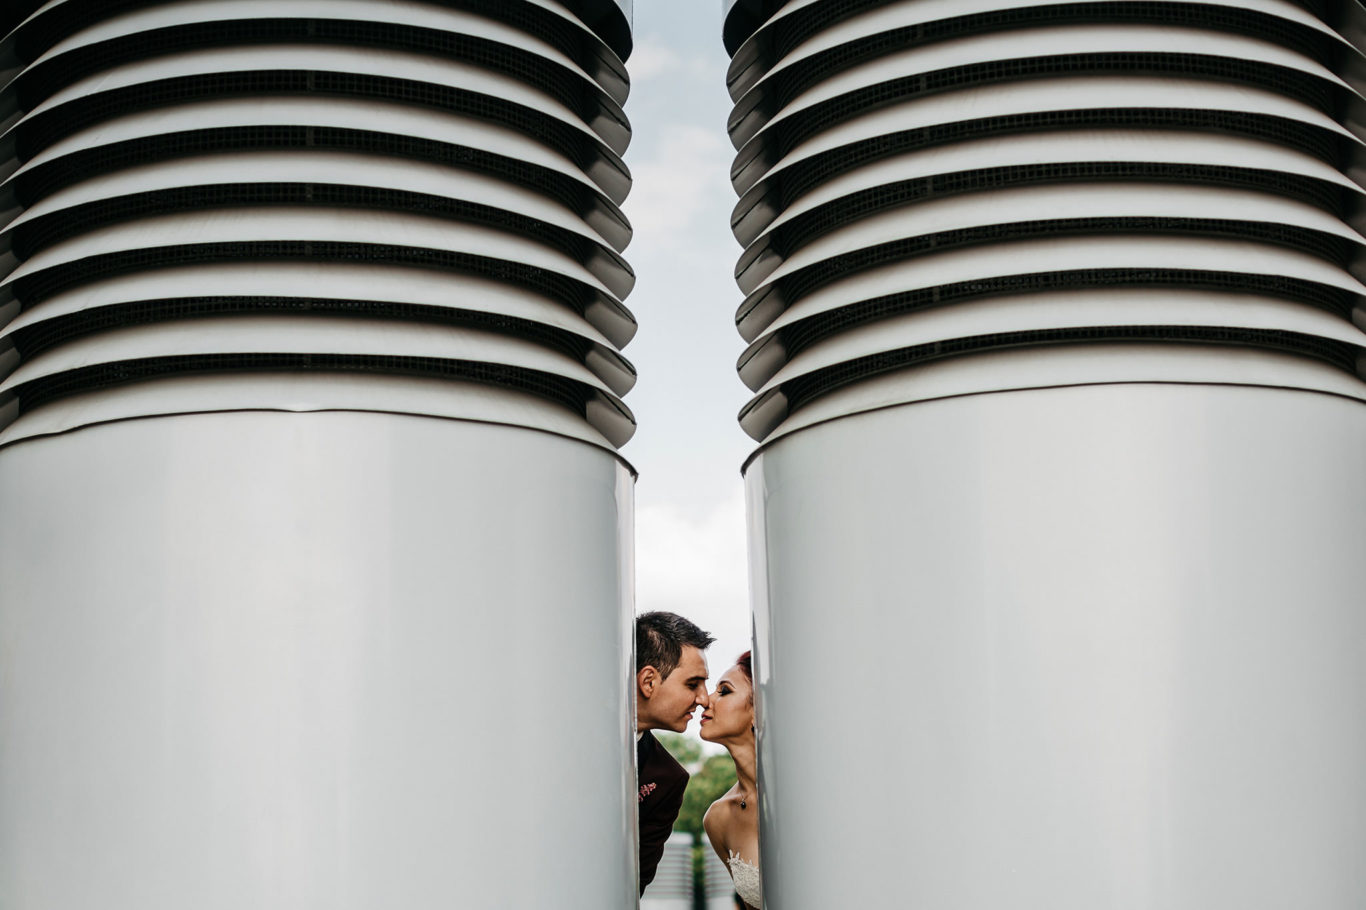 0319-fotografie-nunta-bucuresti-cristina-nicusor-fotograf-ciprian-dumitrescu-cd2_0322